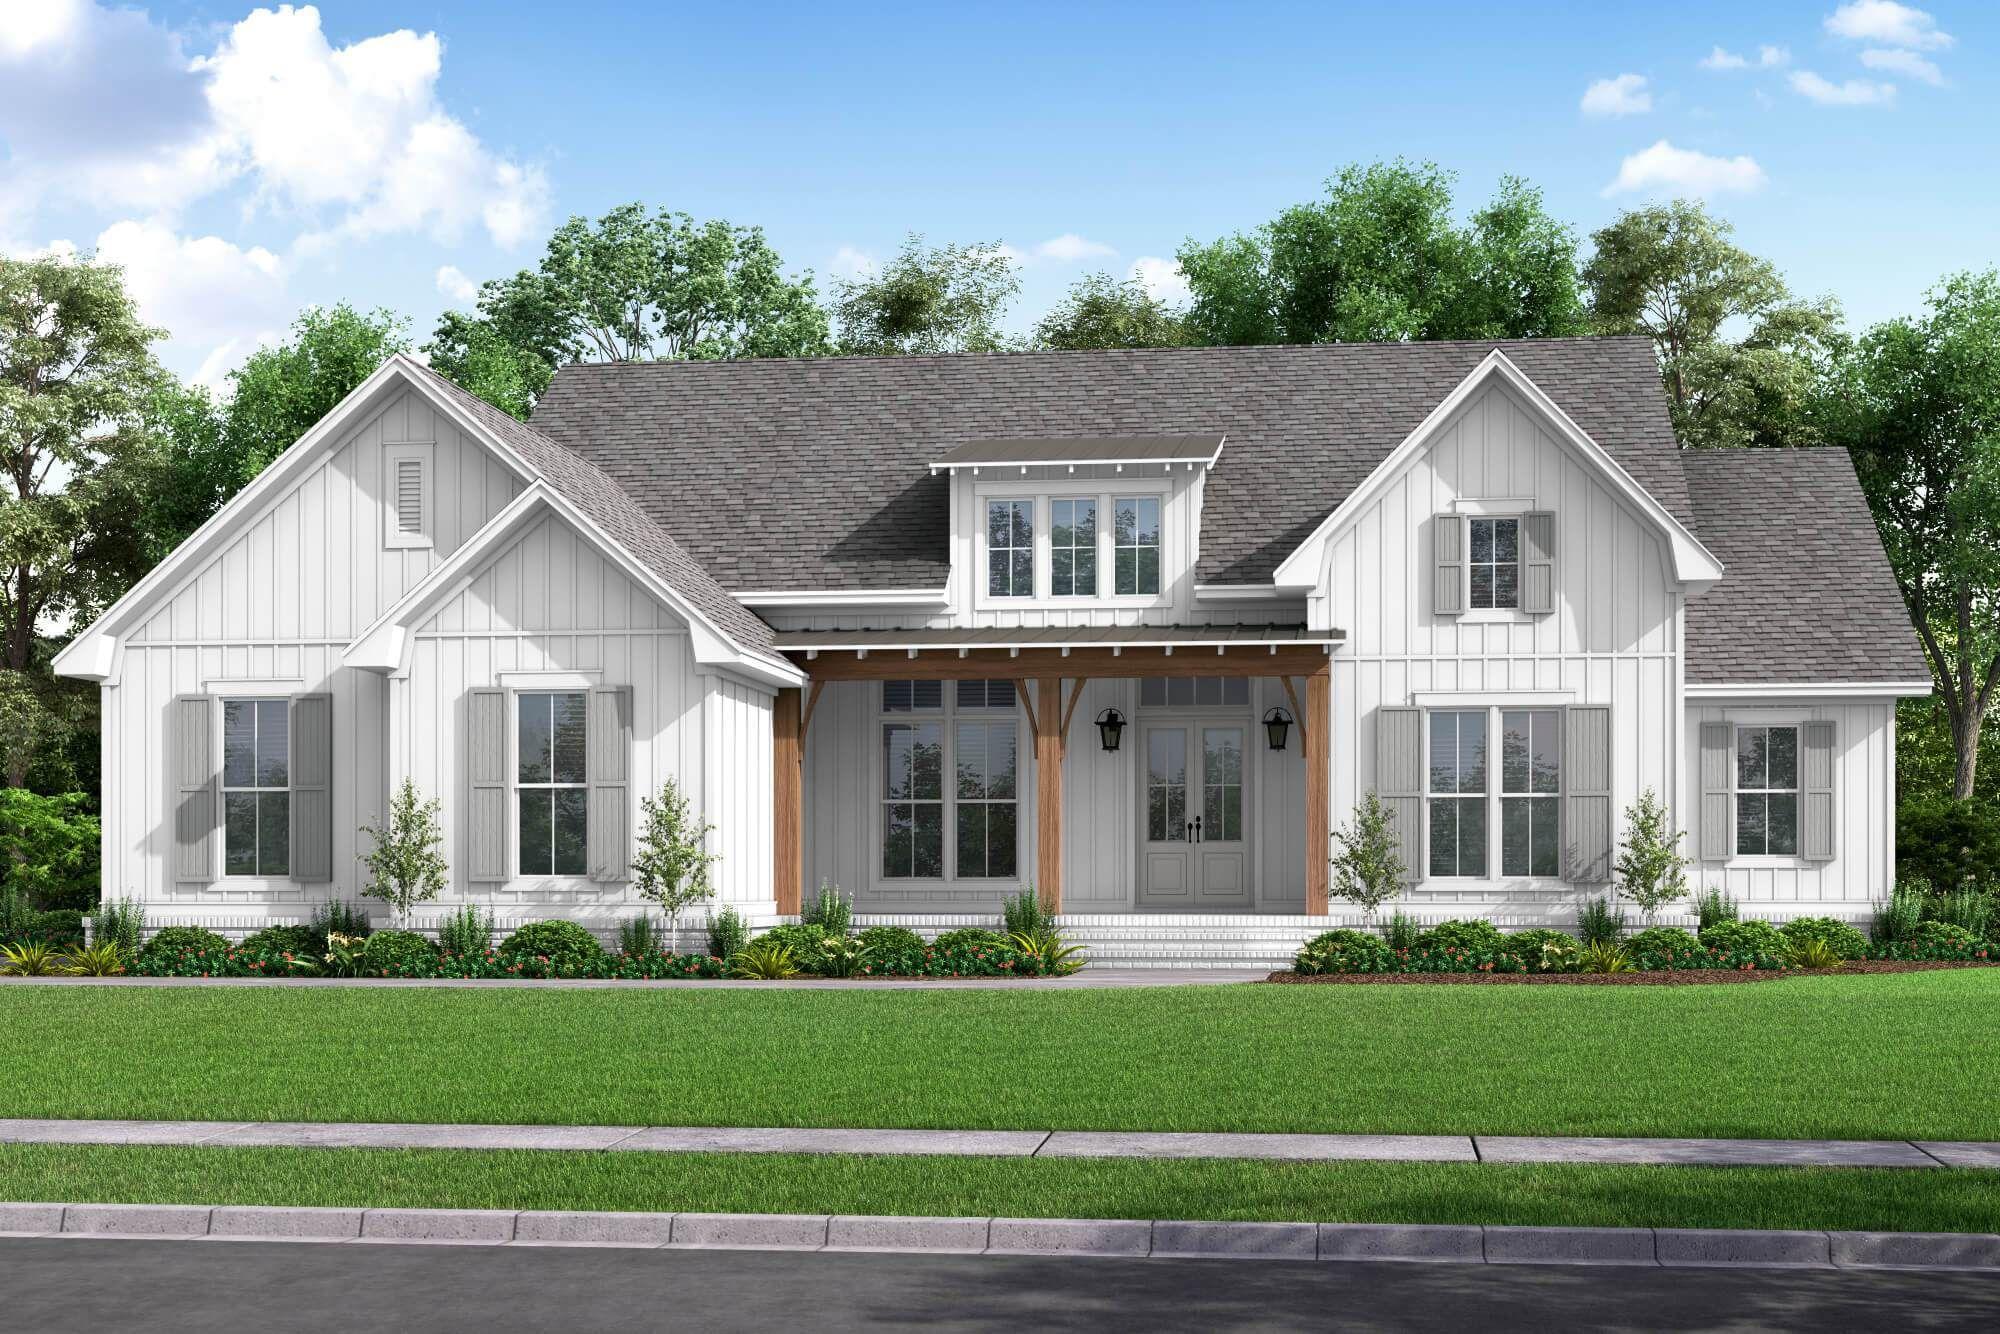 Jackson House Plan In 2020 Modern Farmhouse Plans Farmhouse Style House Plans Farmhouse Plans